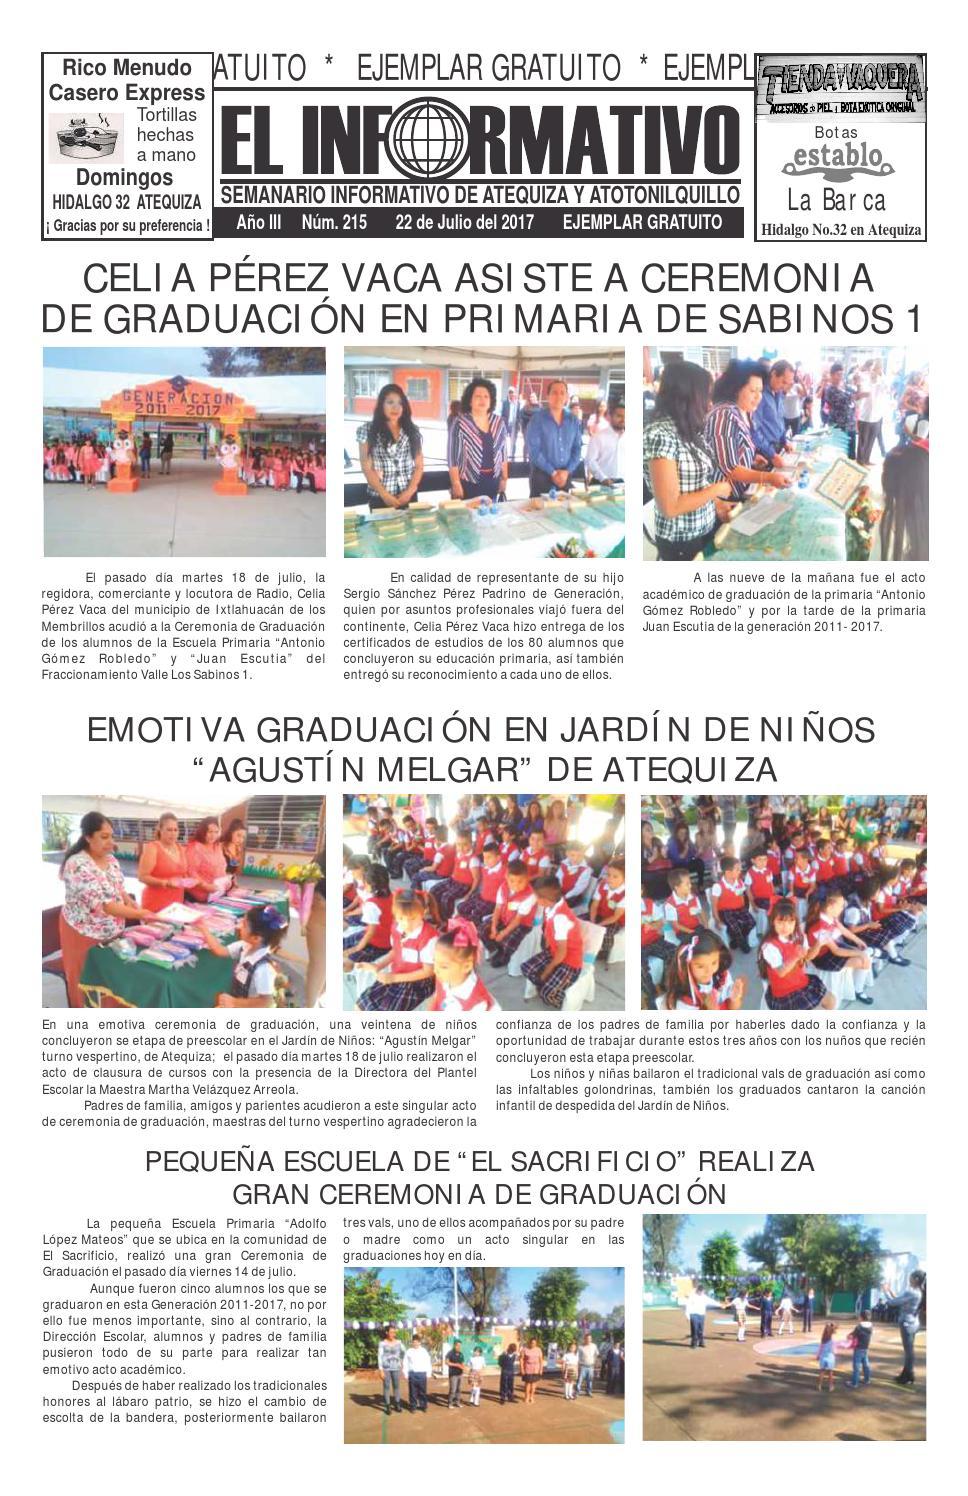 Informativo Atequiza-Atoto 215 by Lehabim Eliezer - issuu